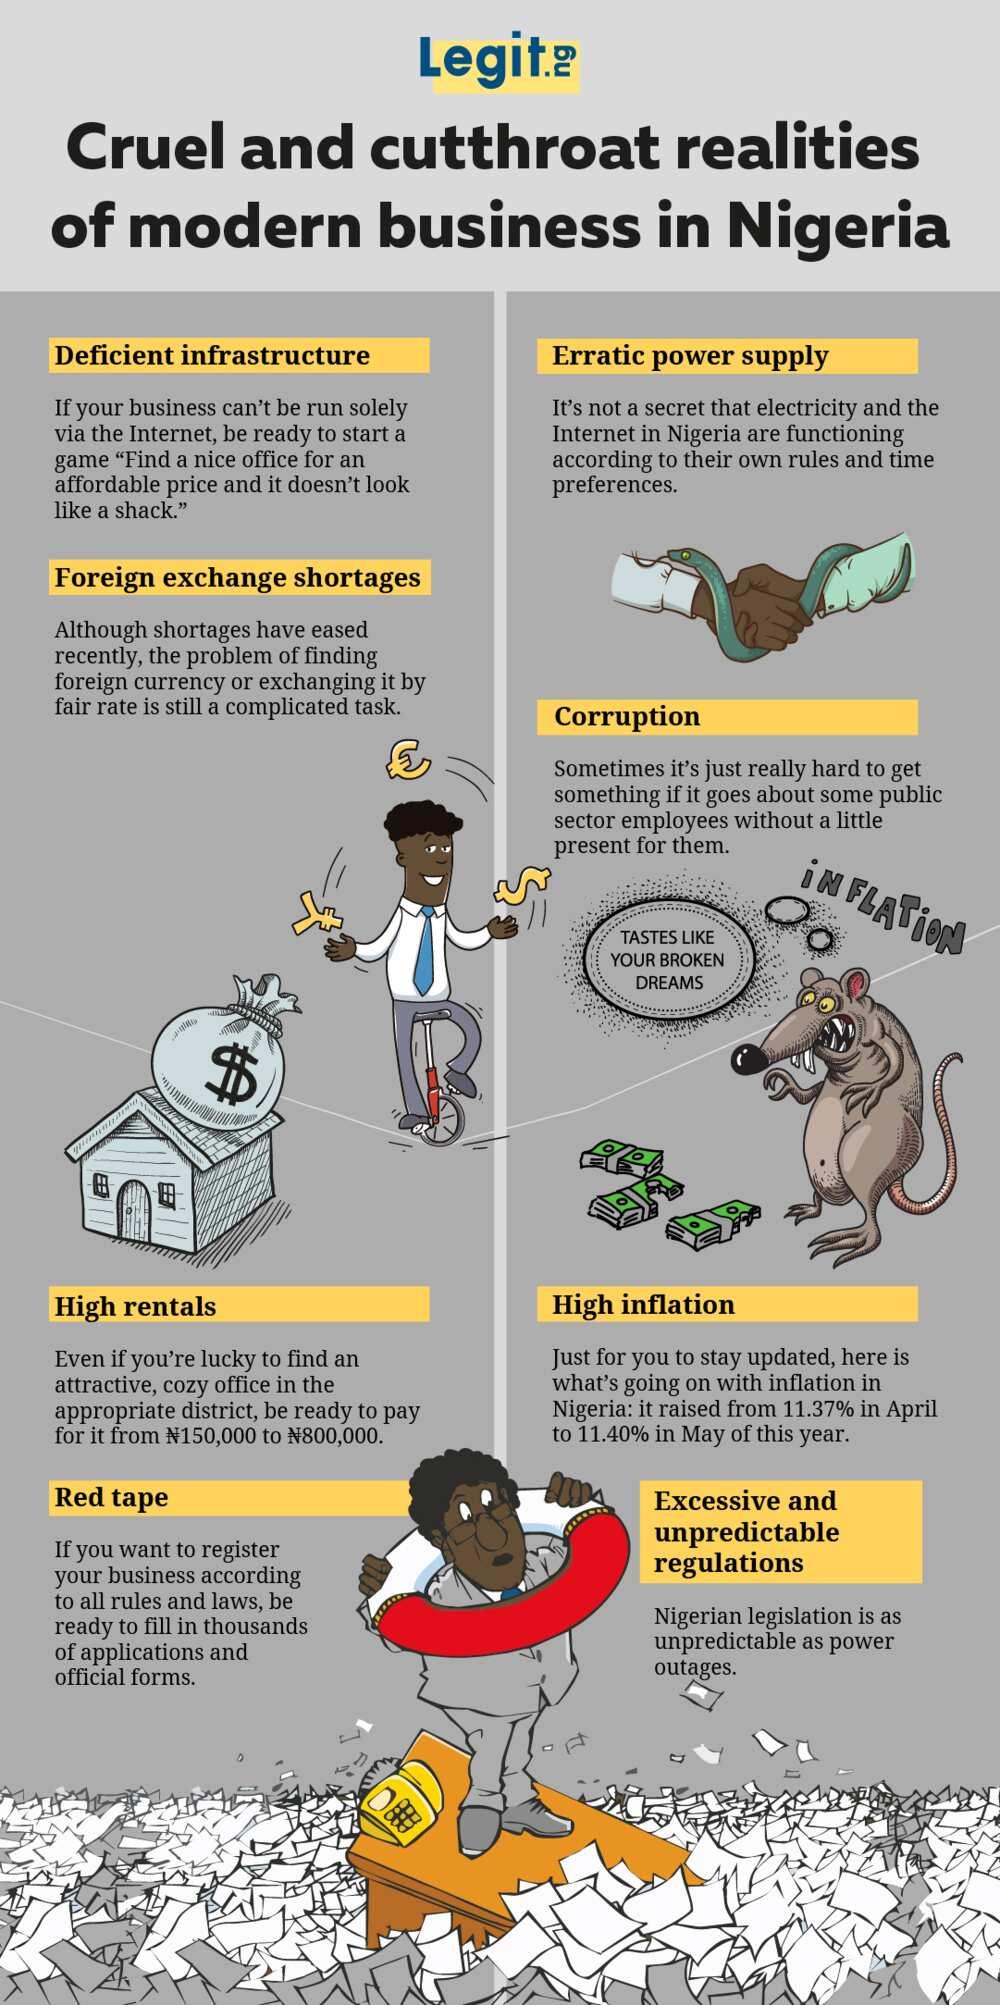 Realities of modern business in Nigeria